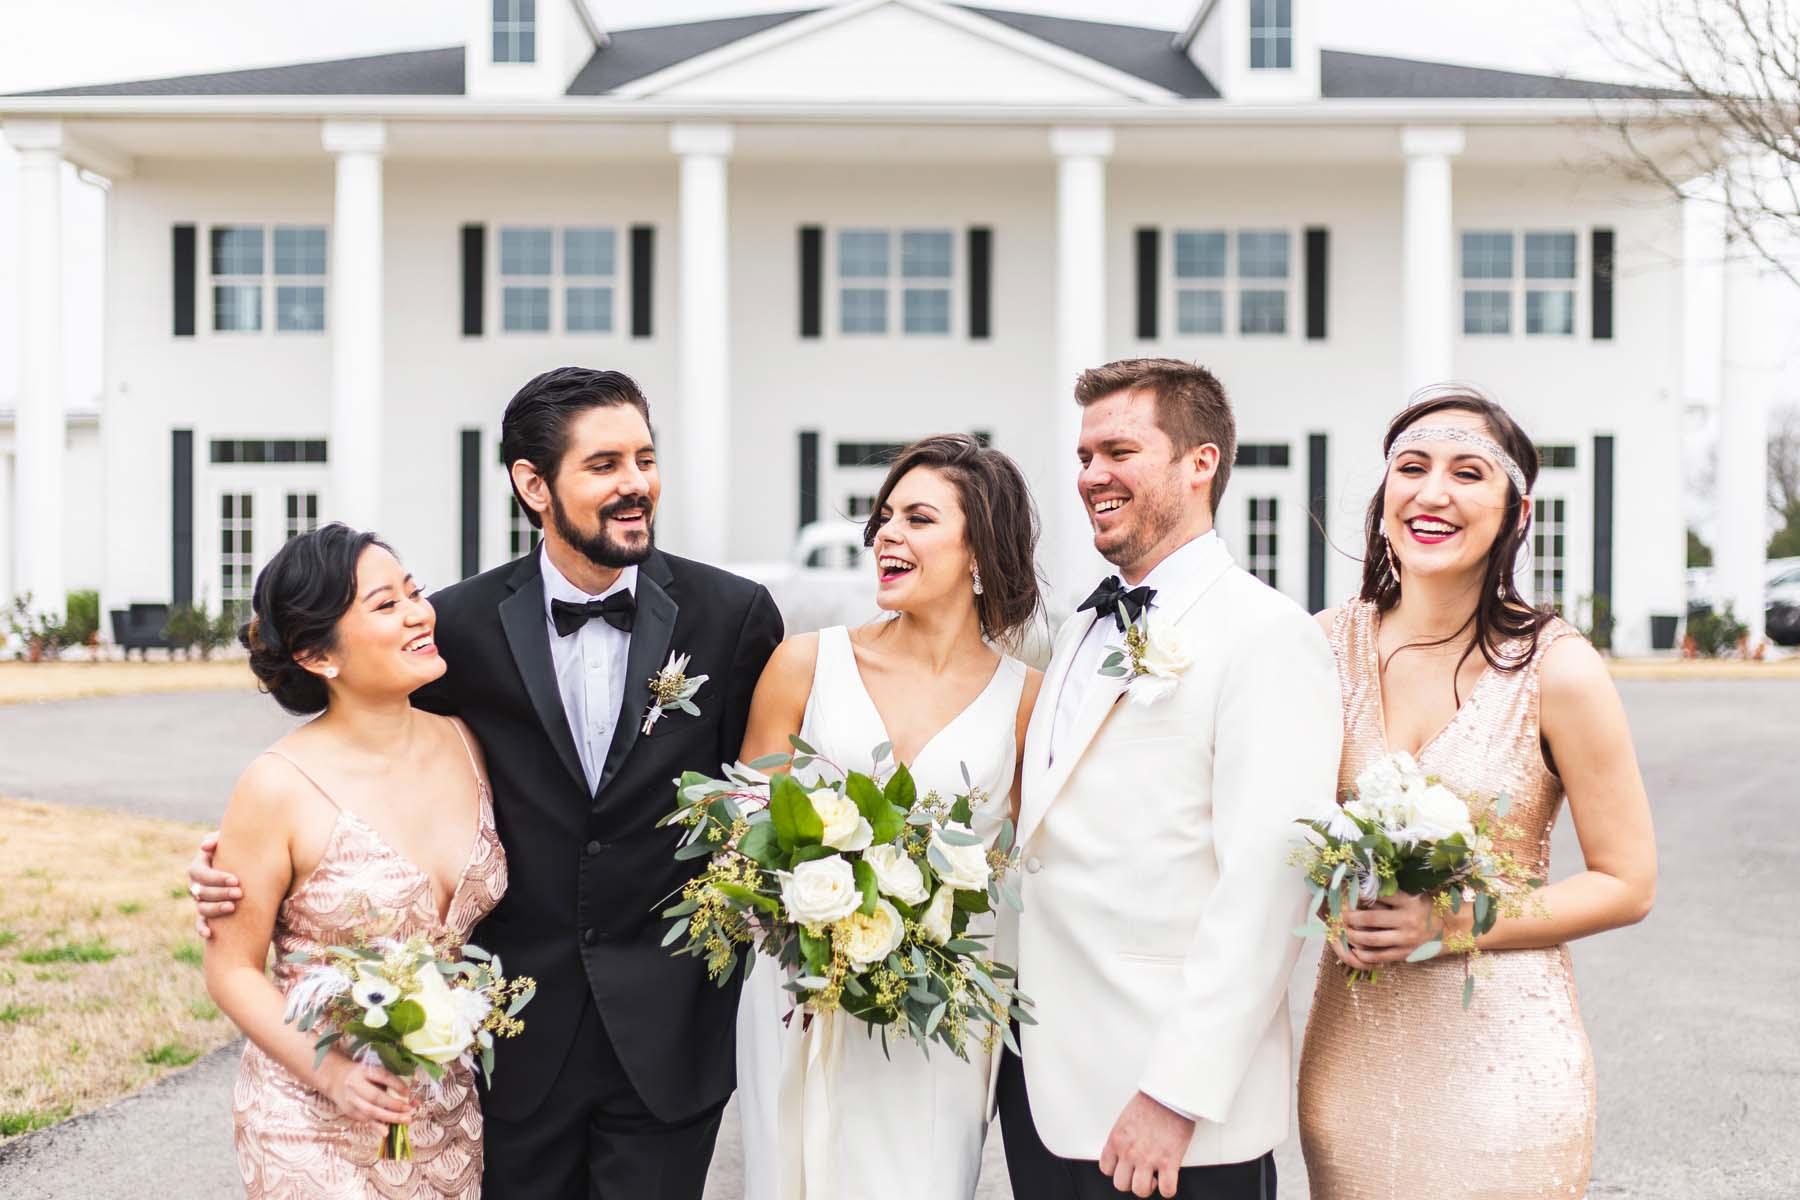 Great Gatsby Wedding by Monika Normand Photography